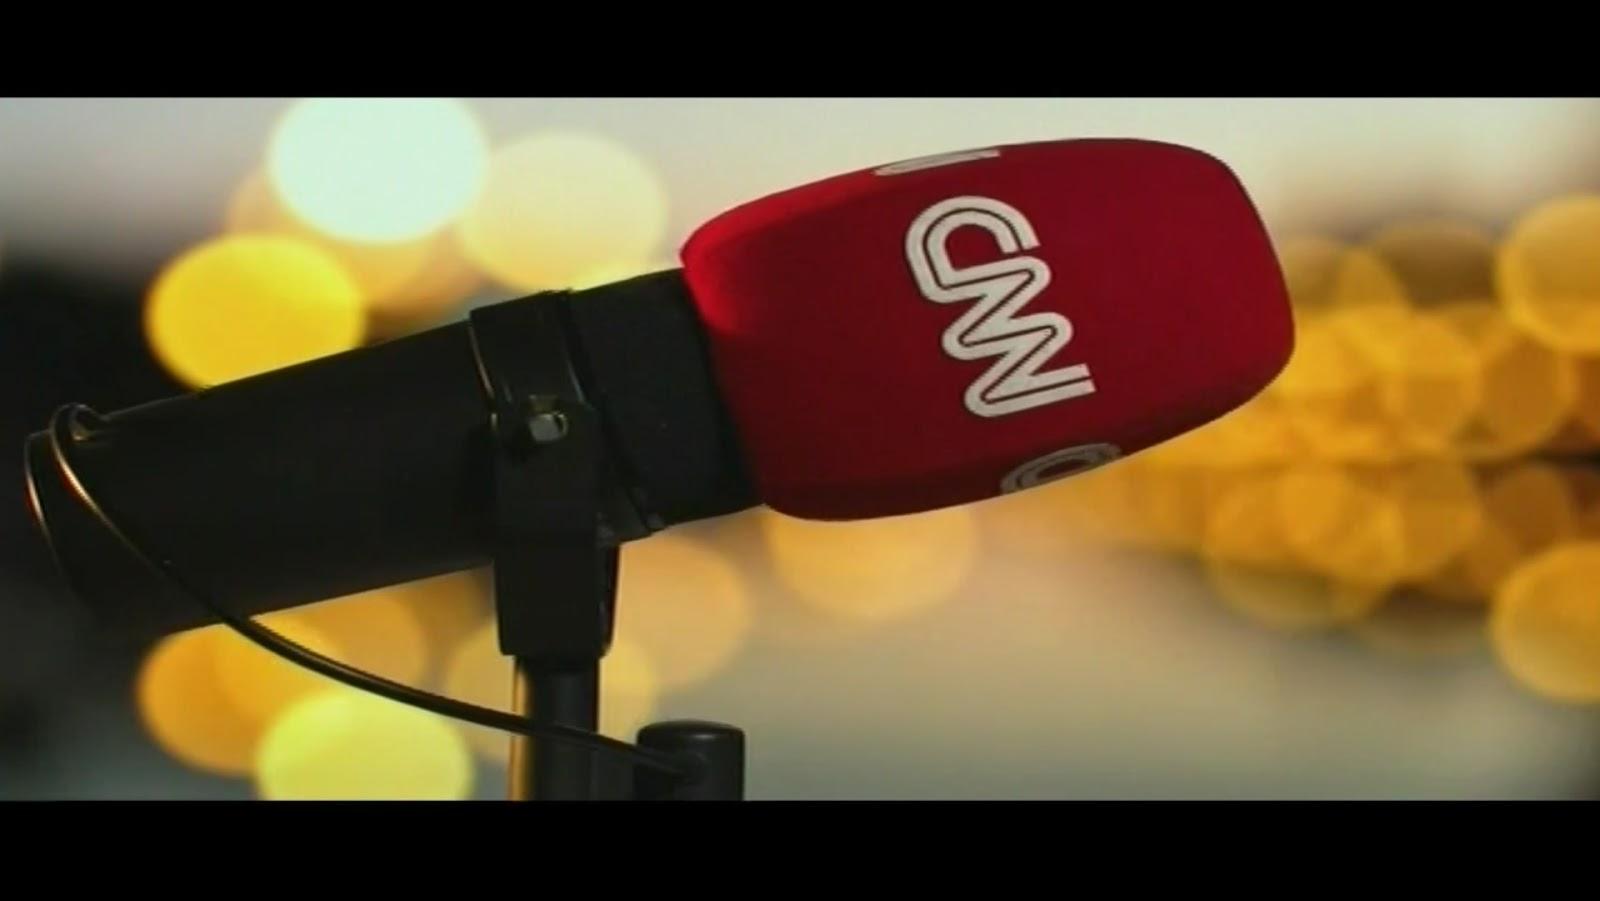 Frekuensi siaran CNN International Asia Pacific di satelit Palapa D Terbaru